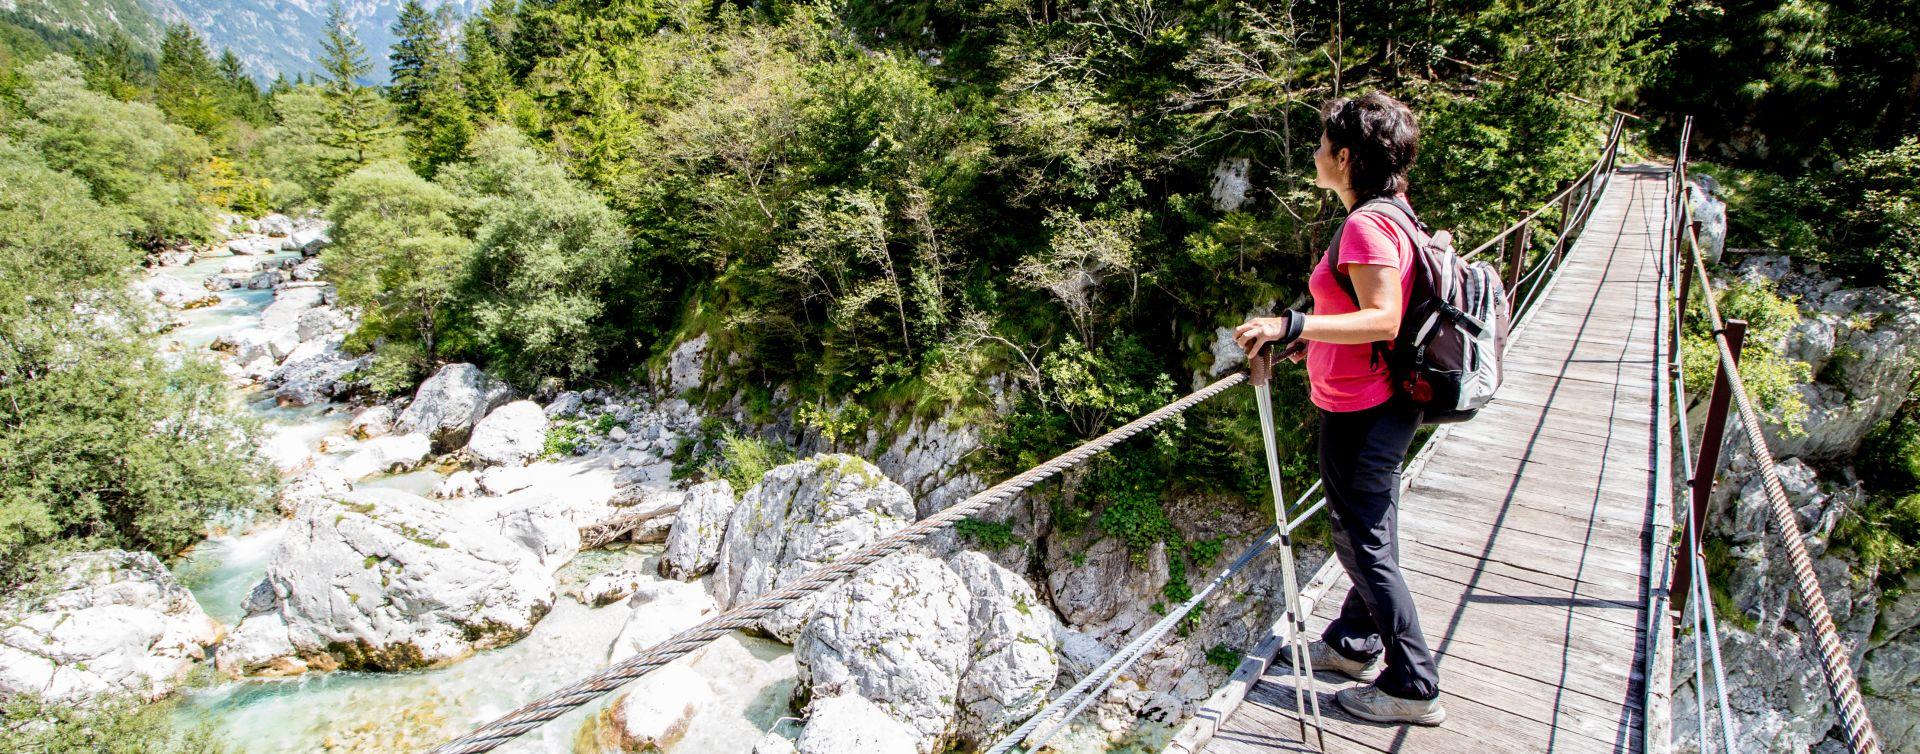 Hiking Alpe Adria Trail Slovenia